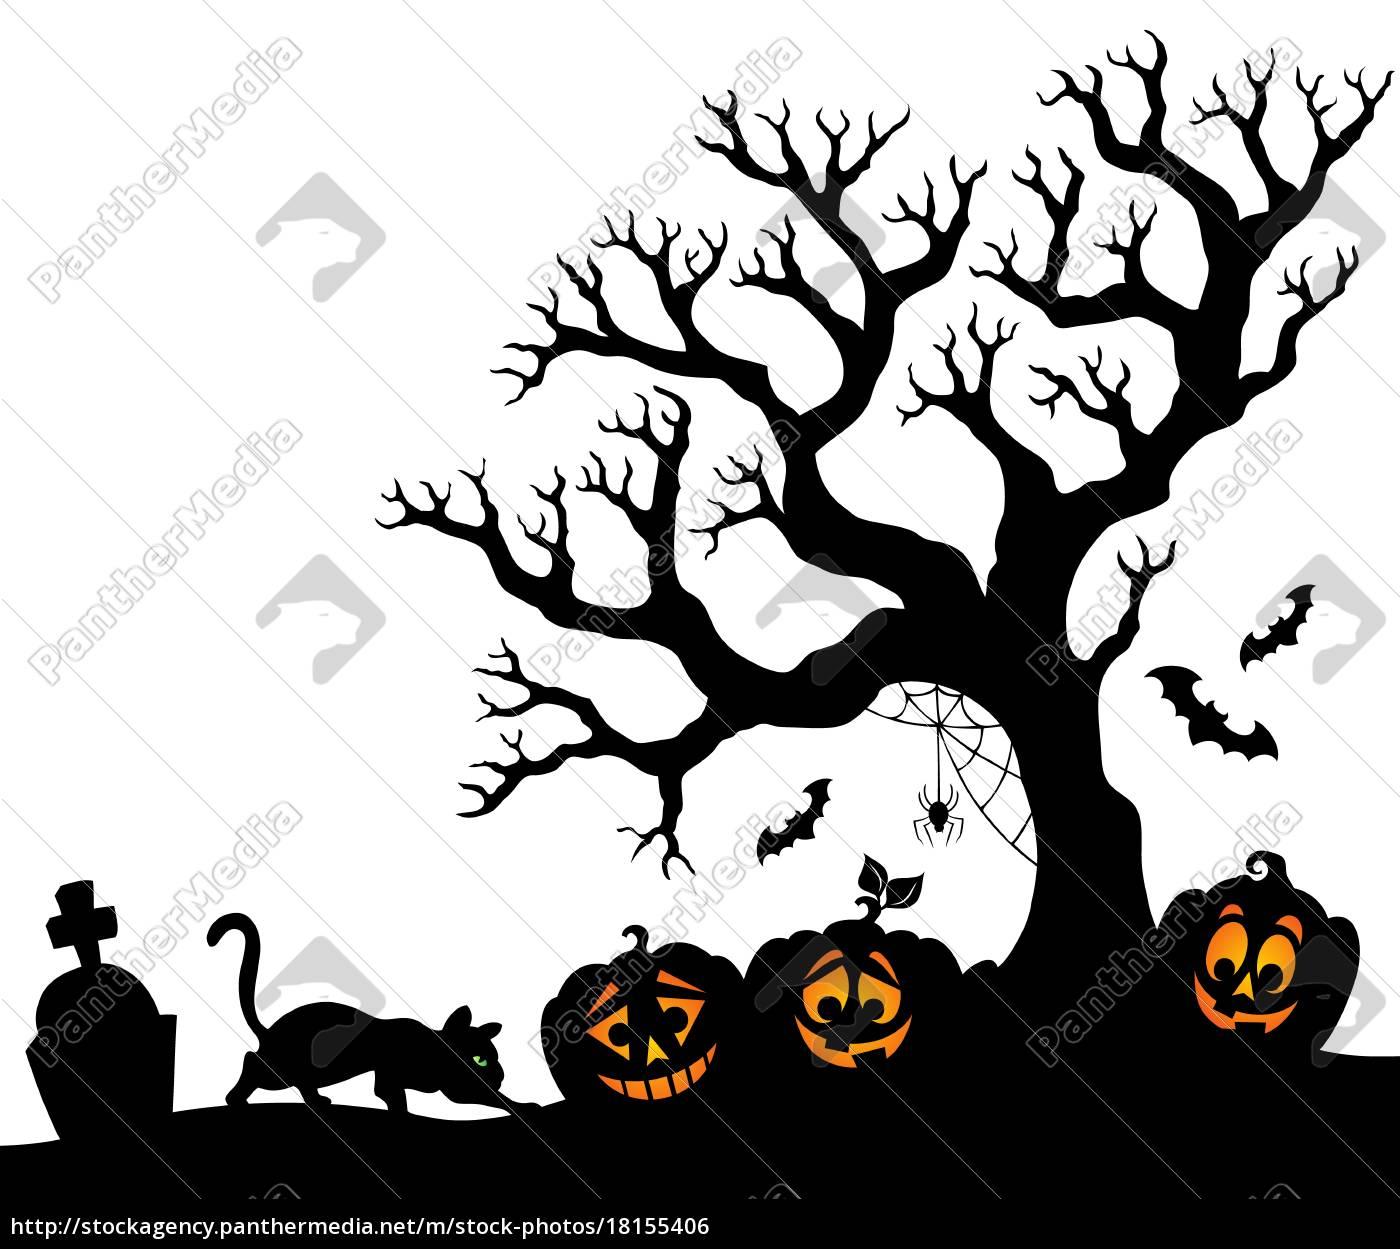 Halloween Thema.Stockfoto 18155406 Halloween Baum Silhouette Thema 1